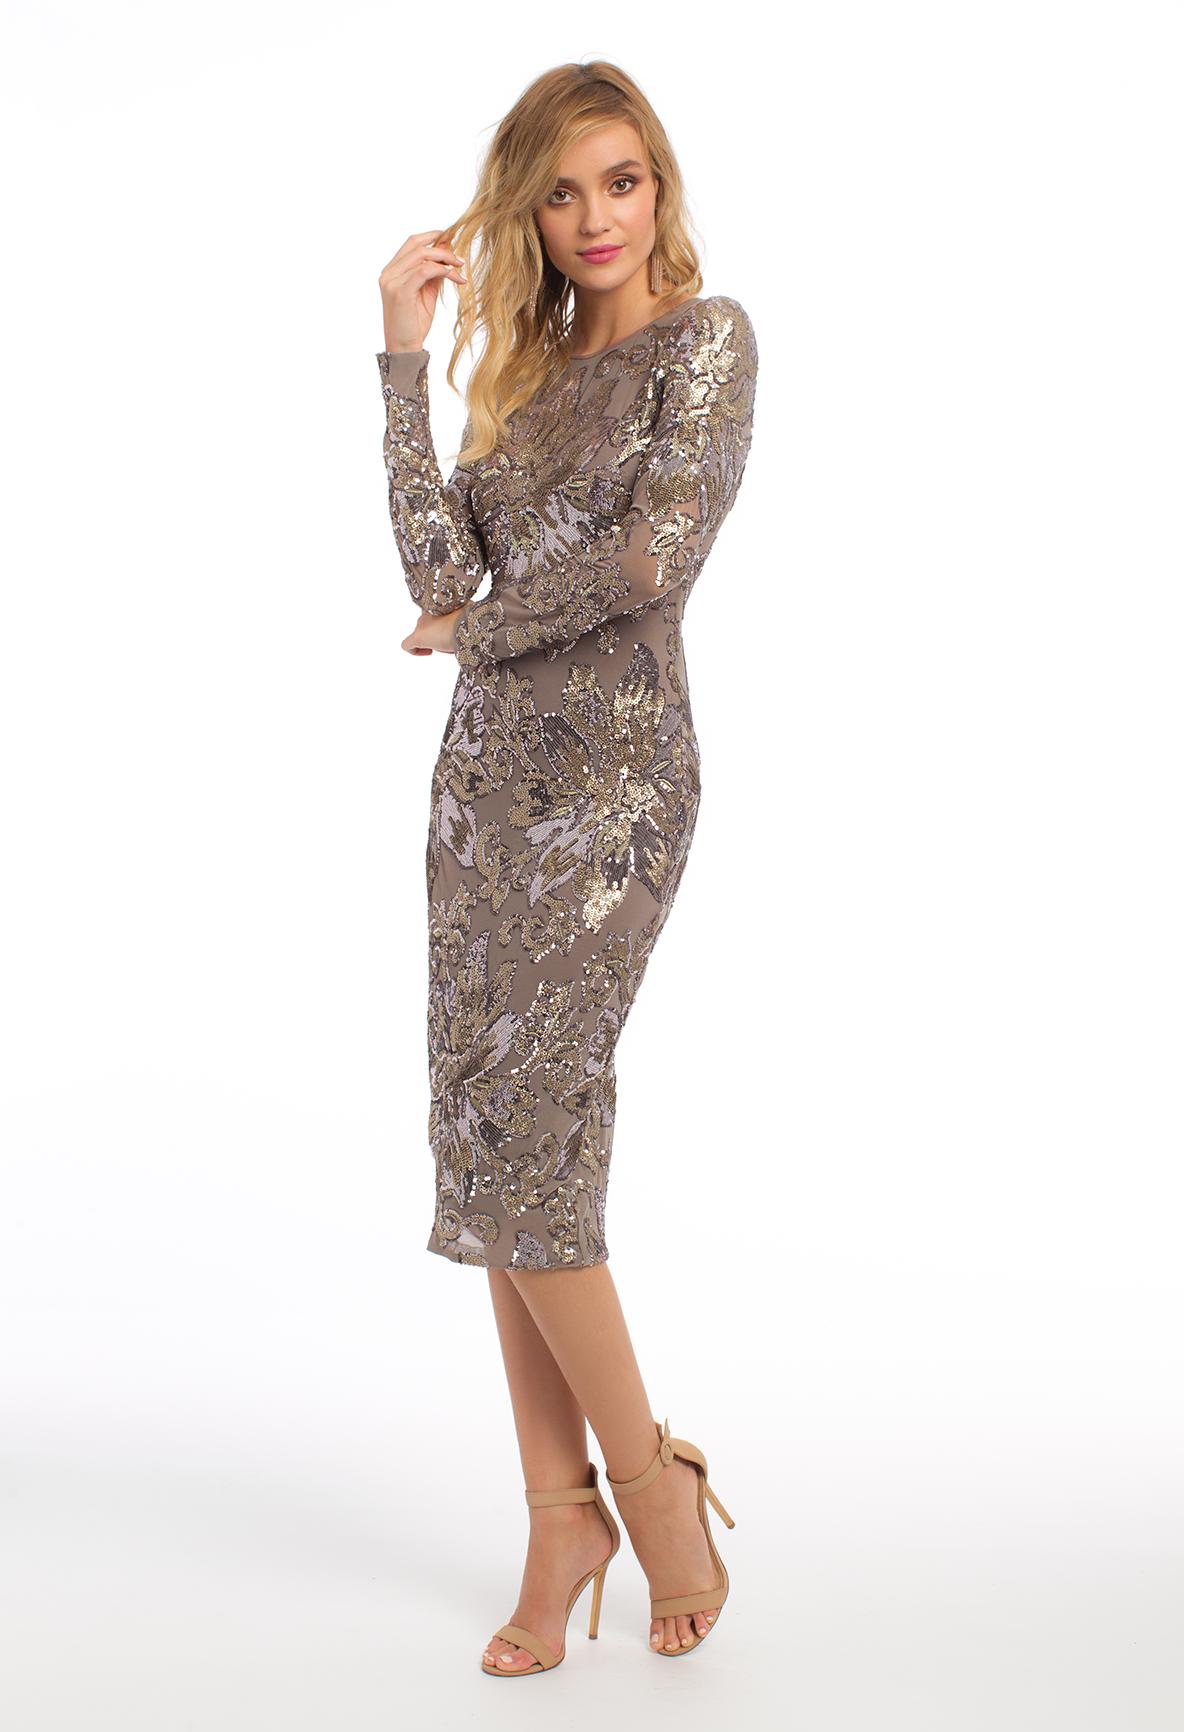 Long sleeve flower pattern sequin dress homecoming dresses